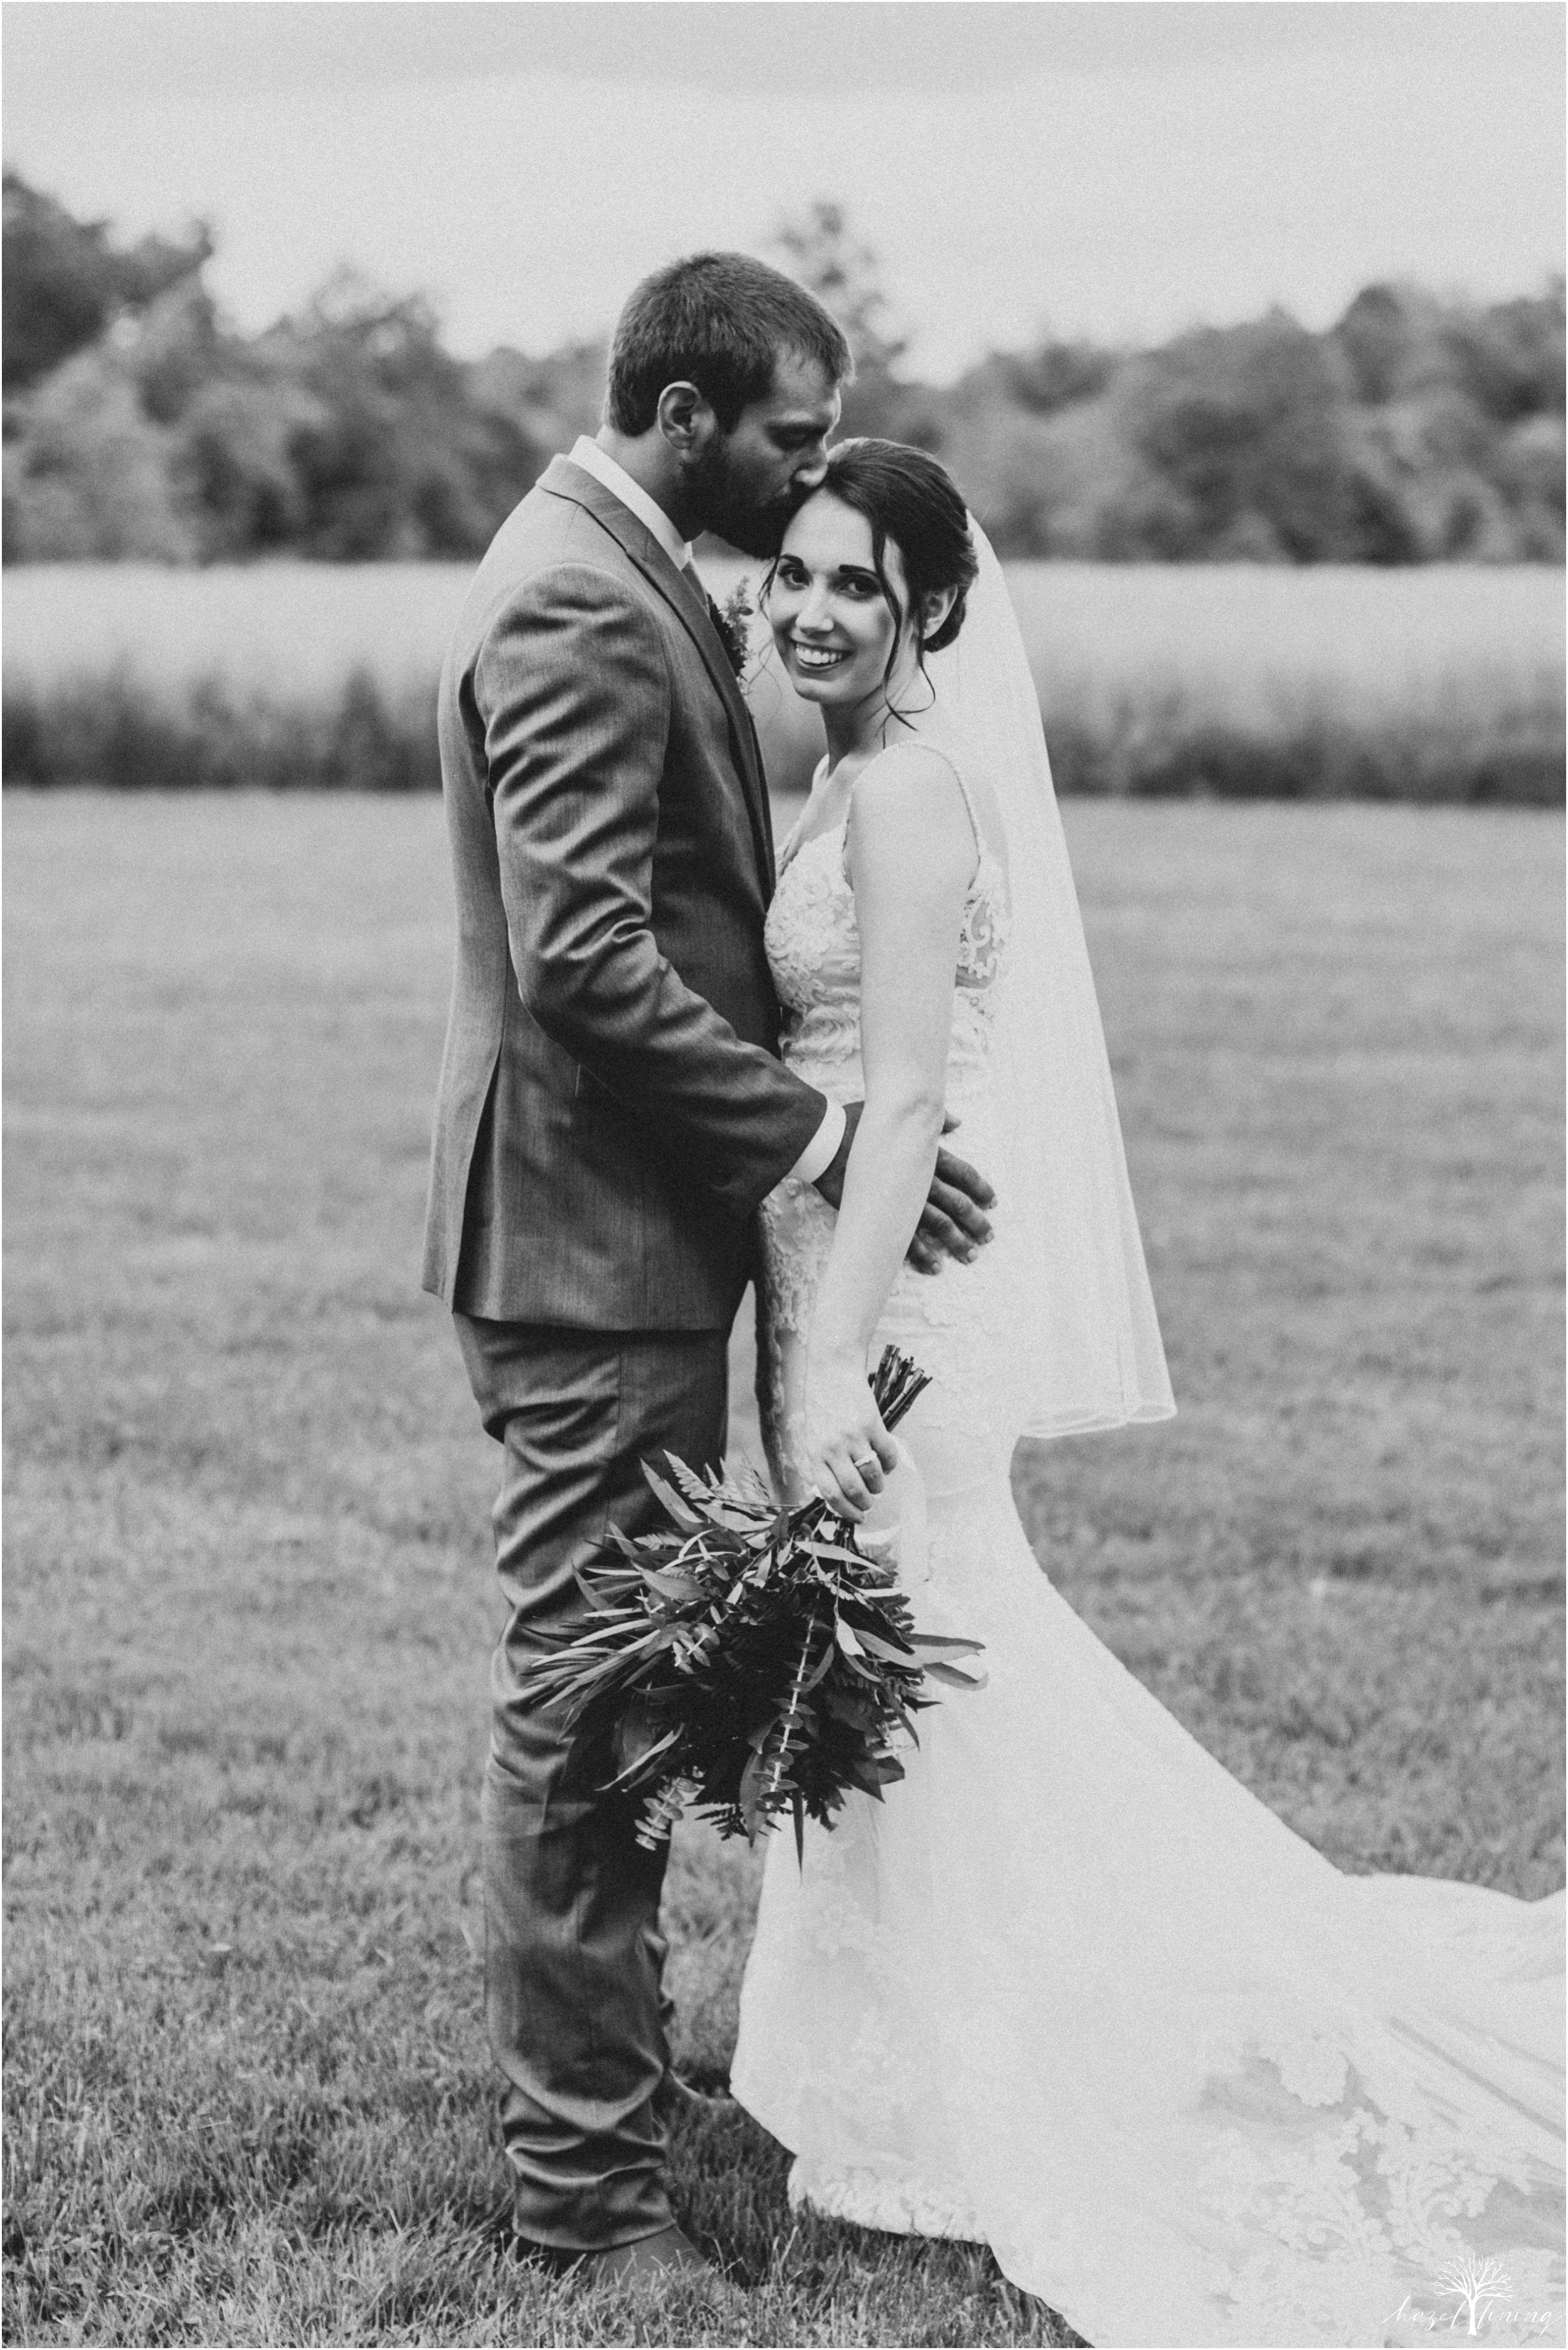 hazel-lining-travel-wedding-elopement-photography-lisa-landon-shoemaker-the-farm-bakery-and-events-bucks-county-quakertown-pennsylvania-summer-country-outdoor-farm-wedding_0083.jpg